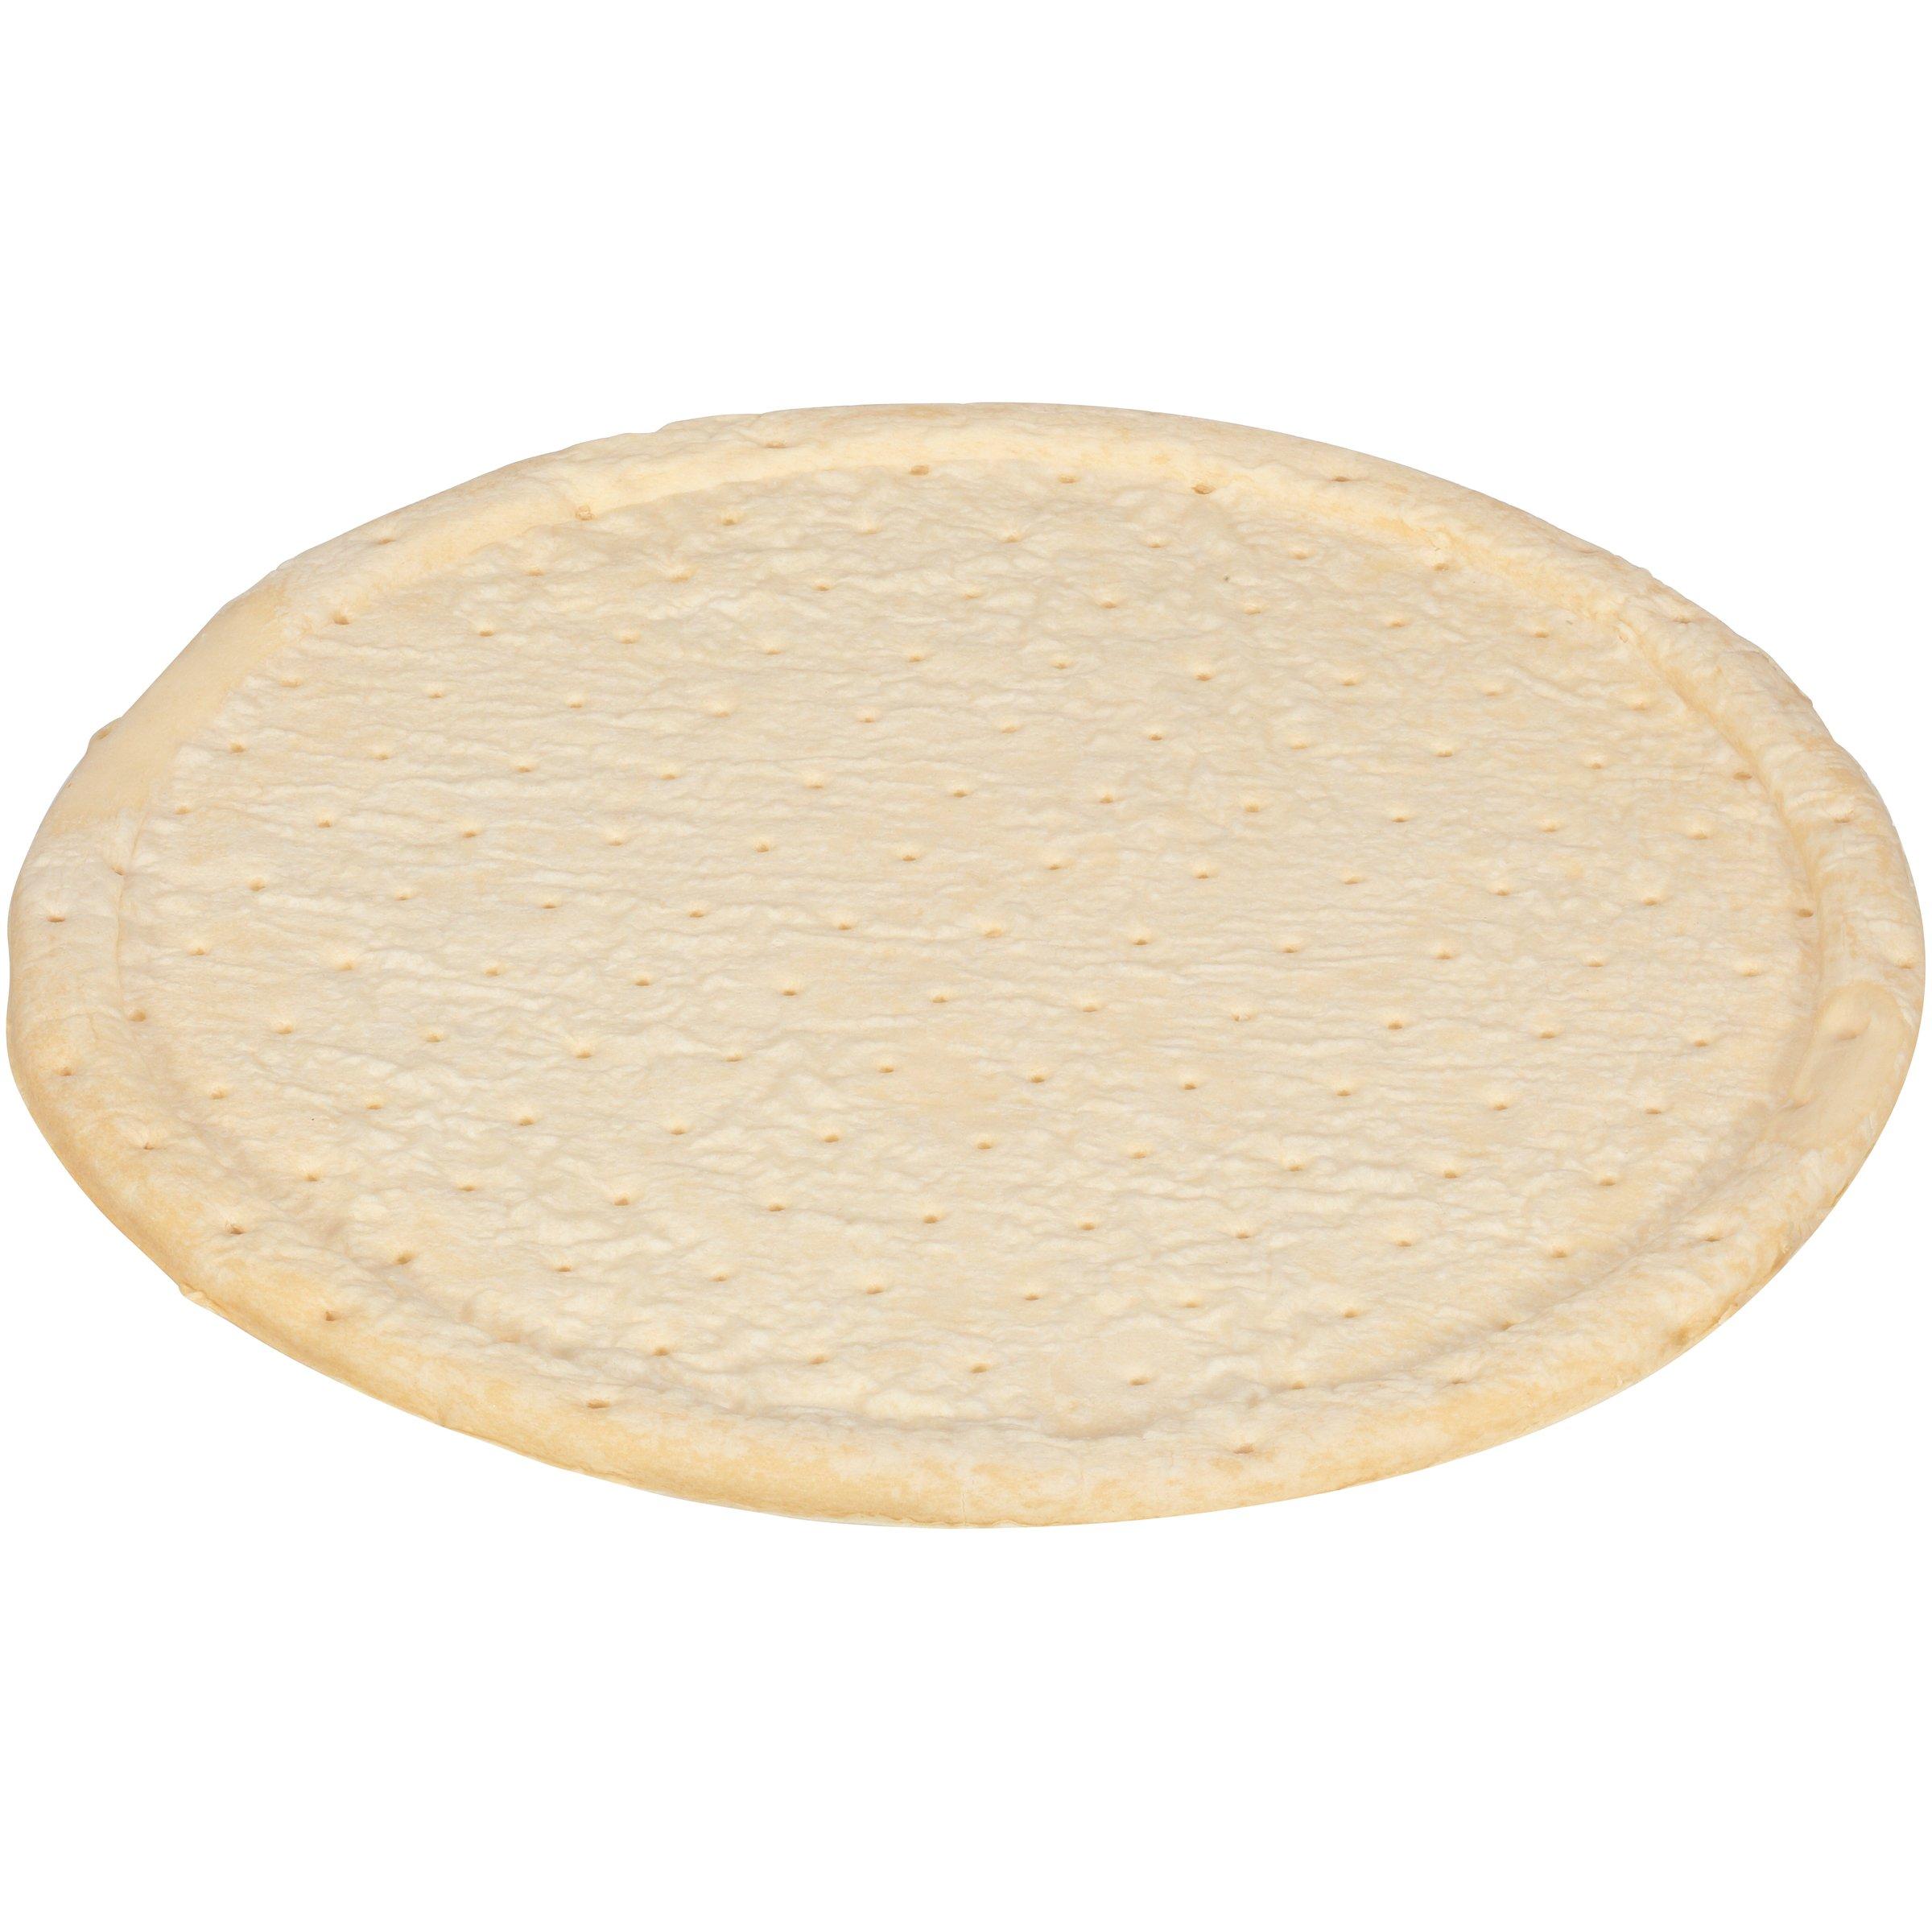 Bonici Readi-Rise Self-Rising 16 inch Pizza Crust, 21 lbs